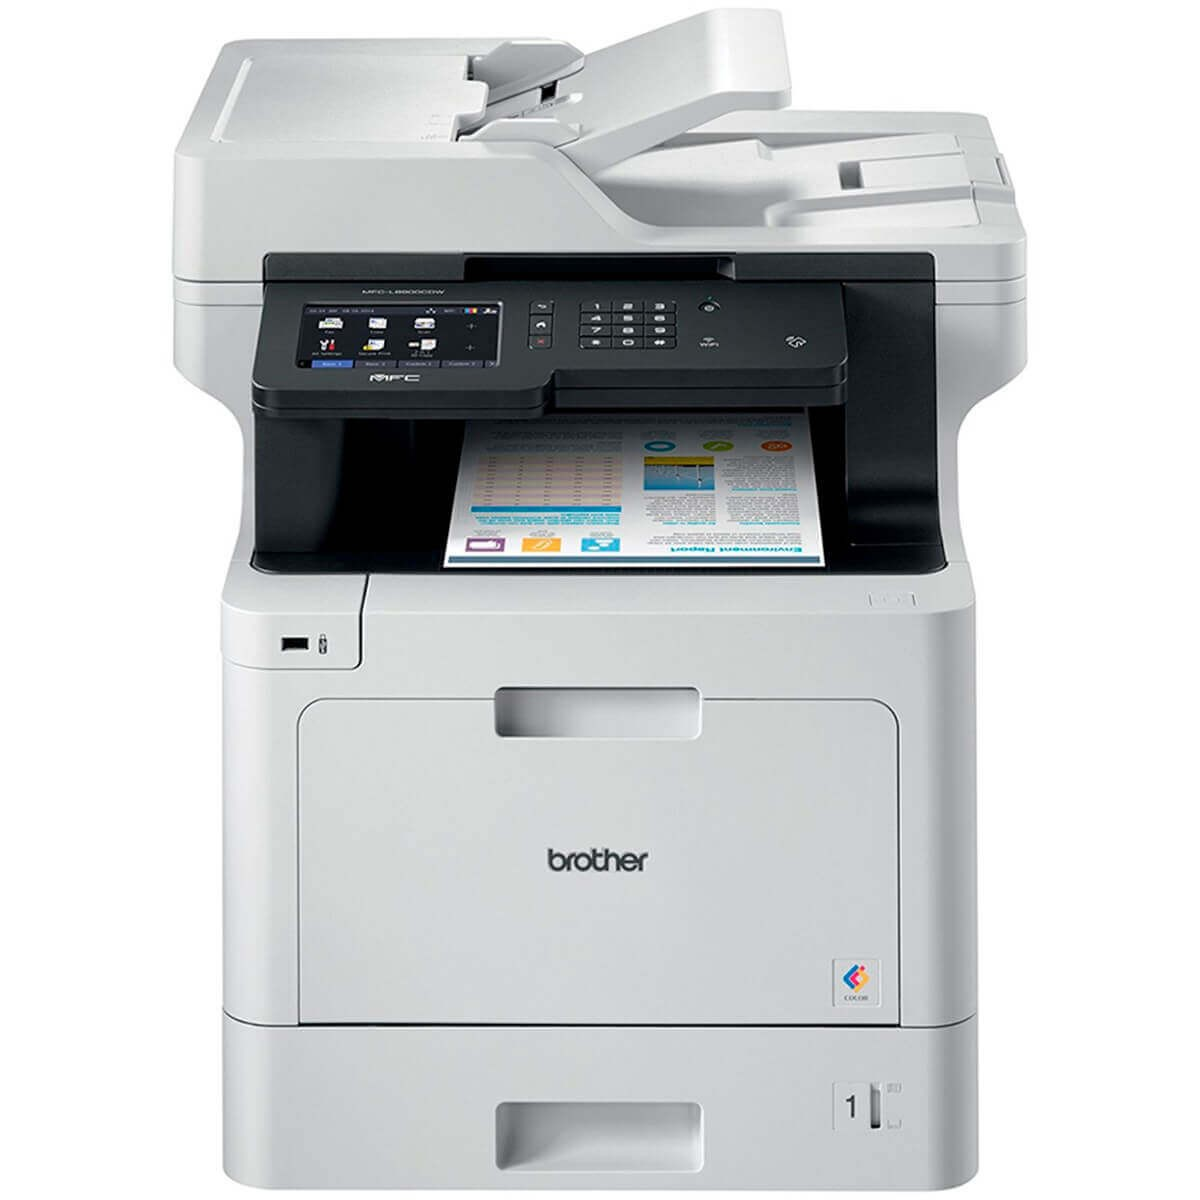 Impressora Multifuncional Brother 8900 Mfc L8900cdw Laser